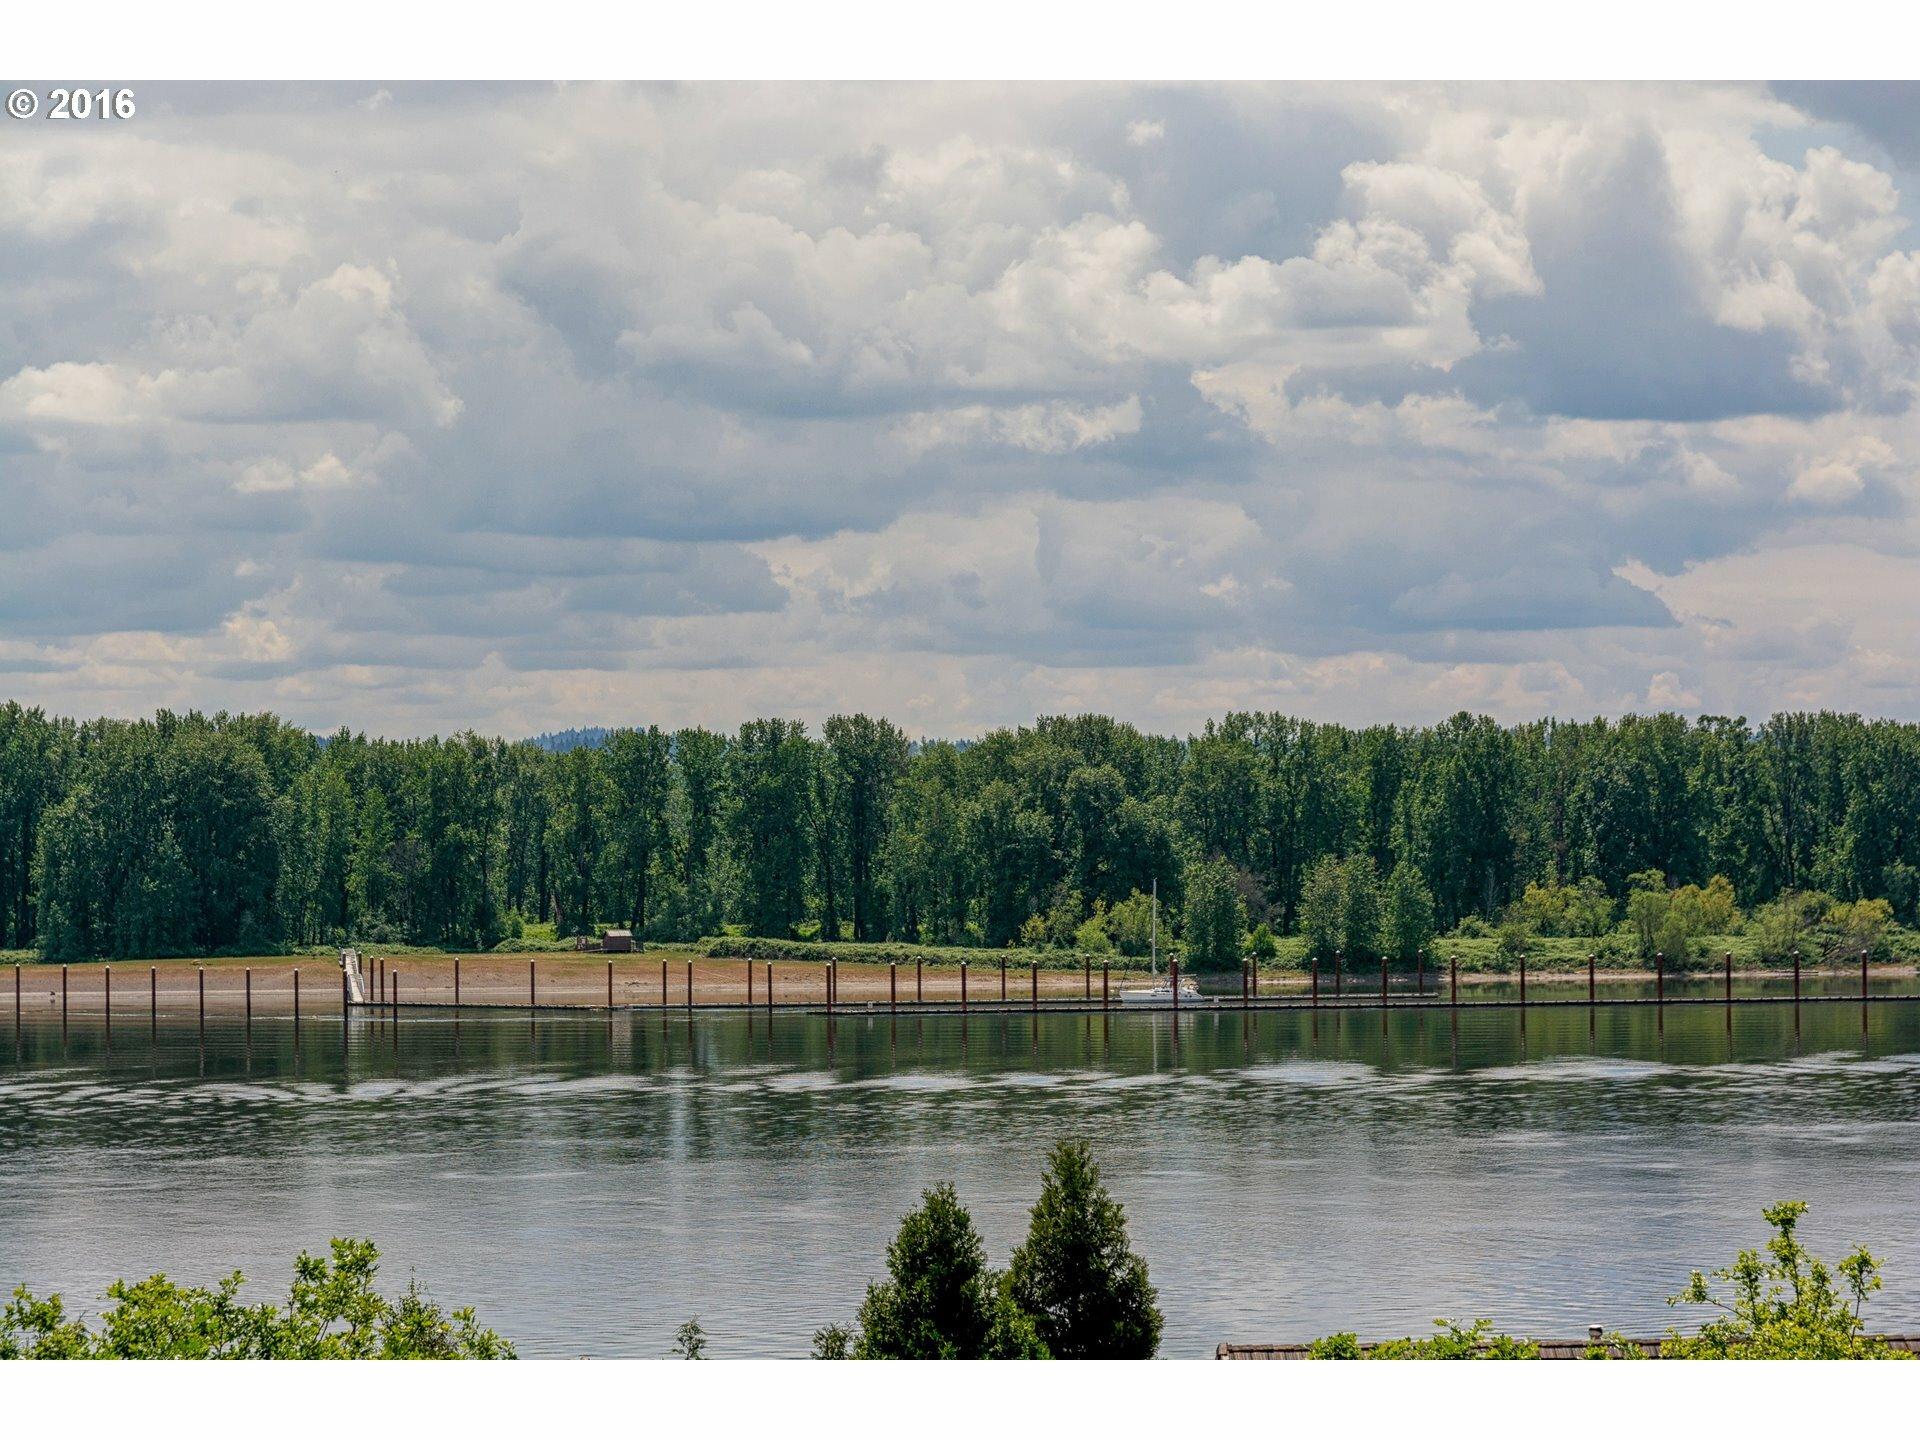 15613 Se Evergreen Hwy, Vancouver, WA - USA (photo 3)